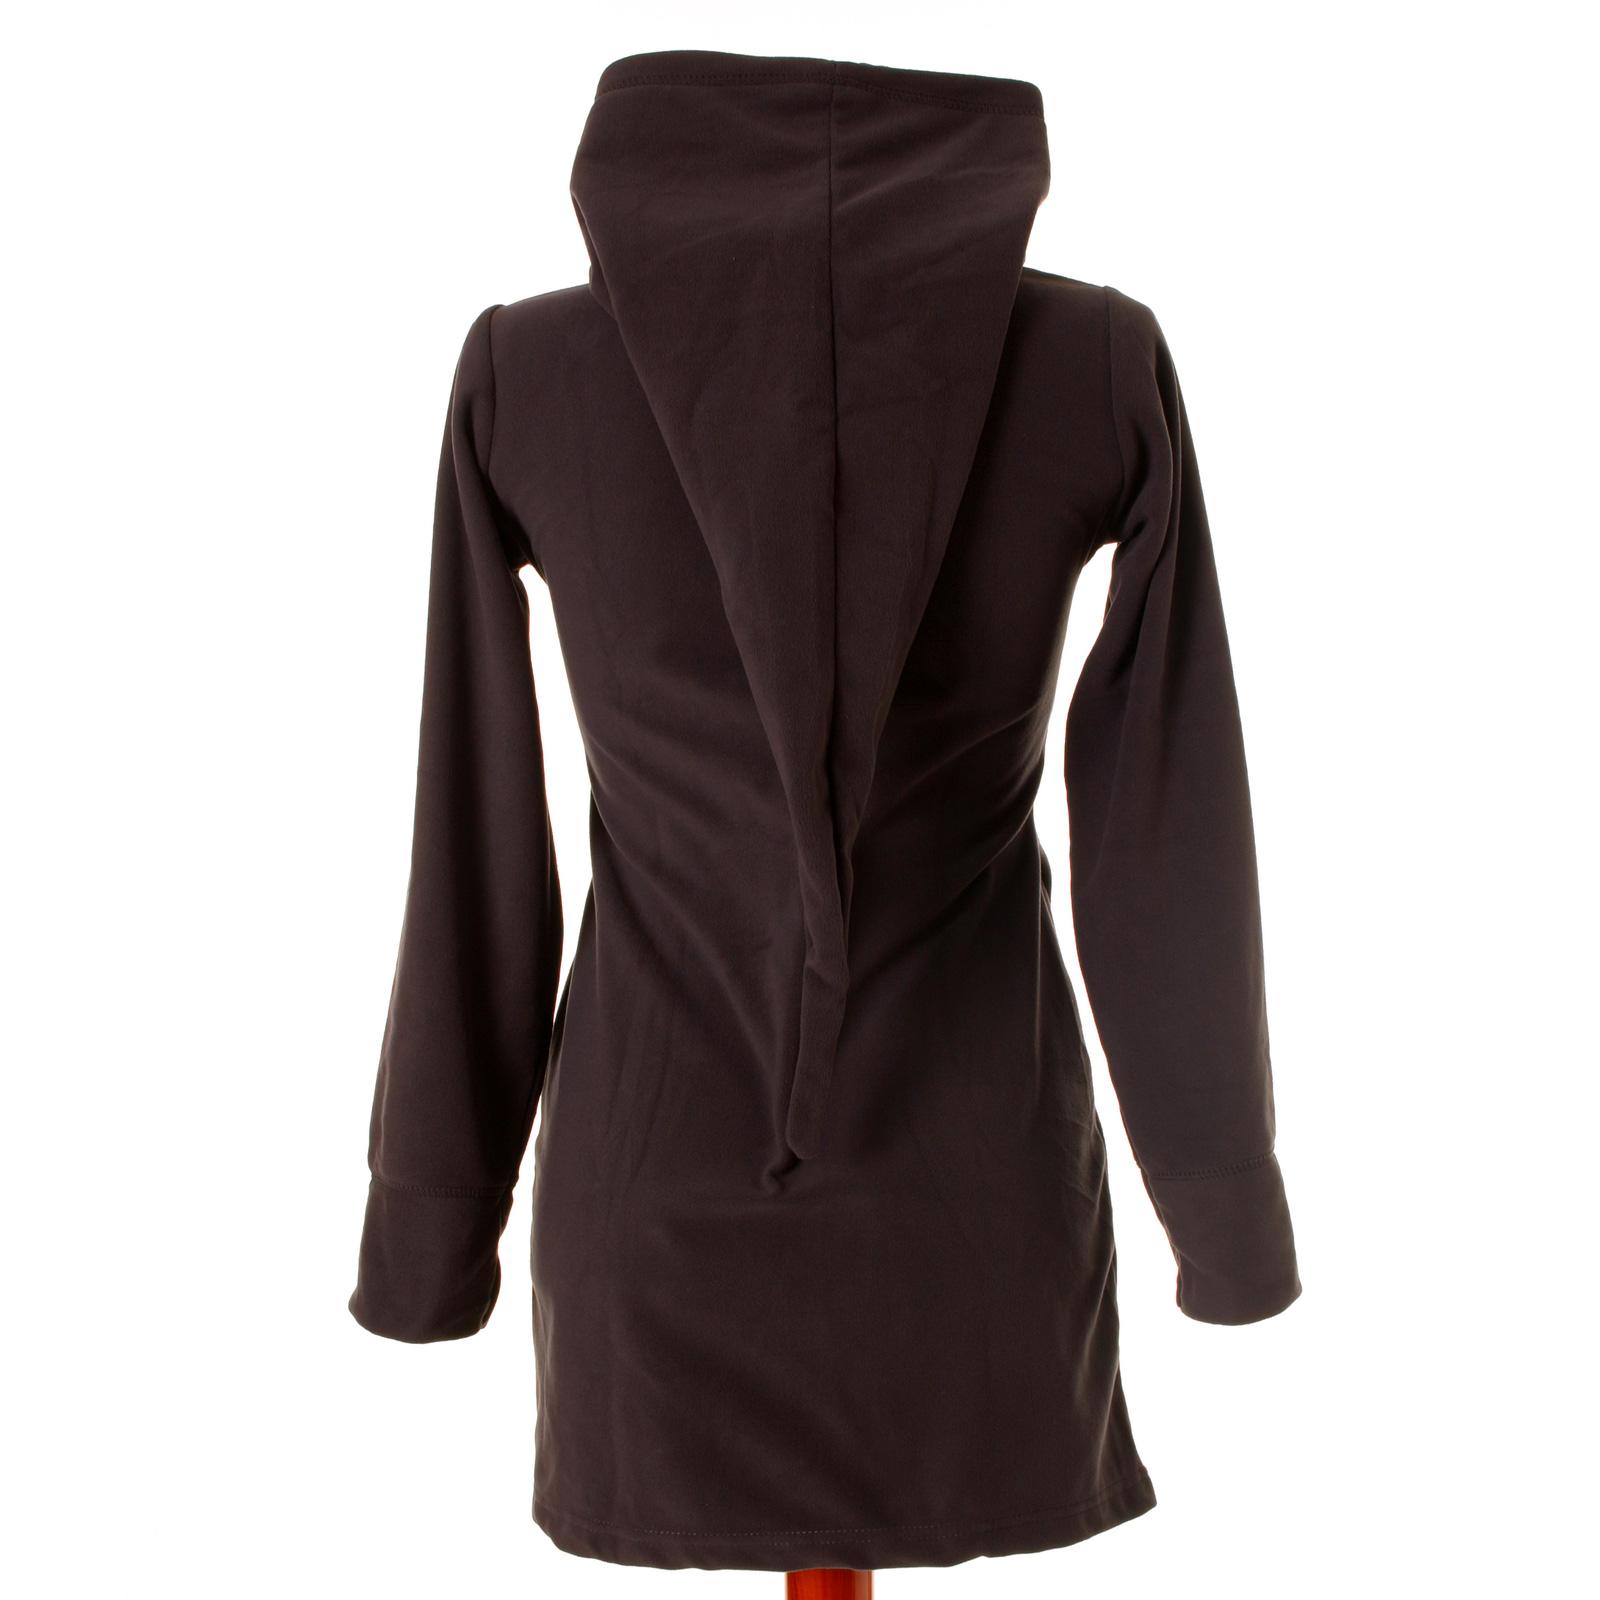 vishes damen fleece mantel jacke warme jacke zipfelkapuze. Black Bedroom Furniture Sets. Home Design Ideas